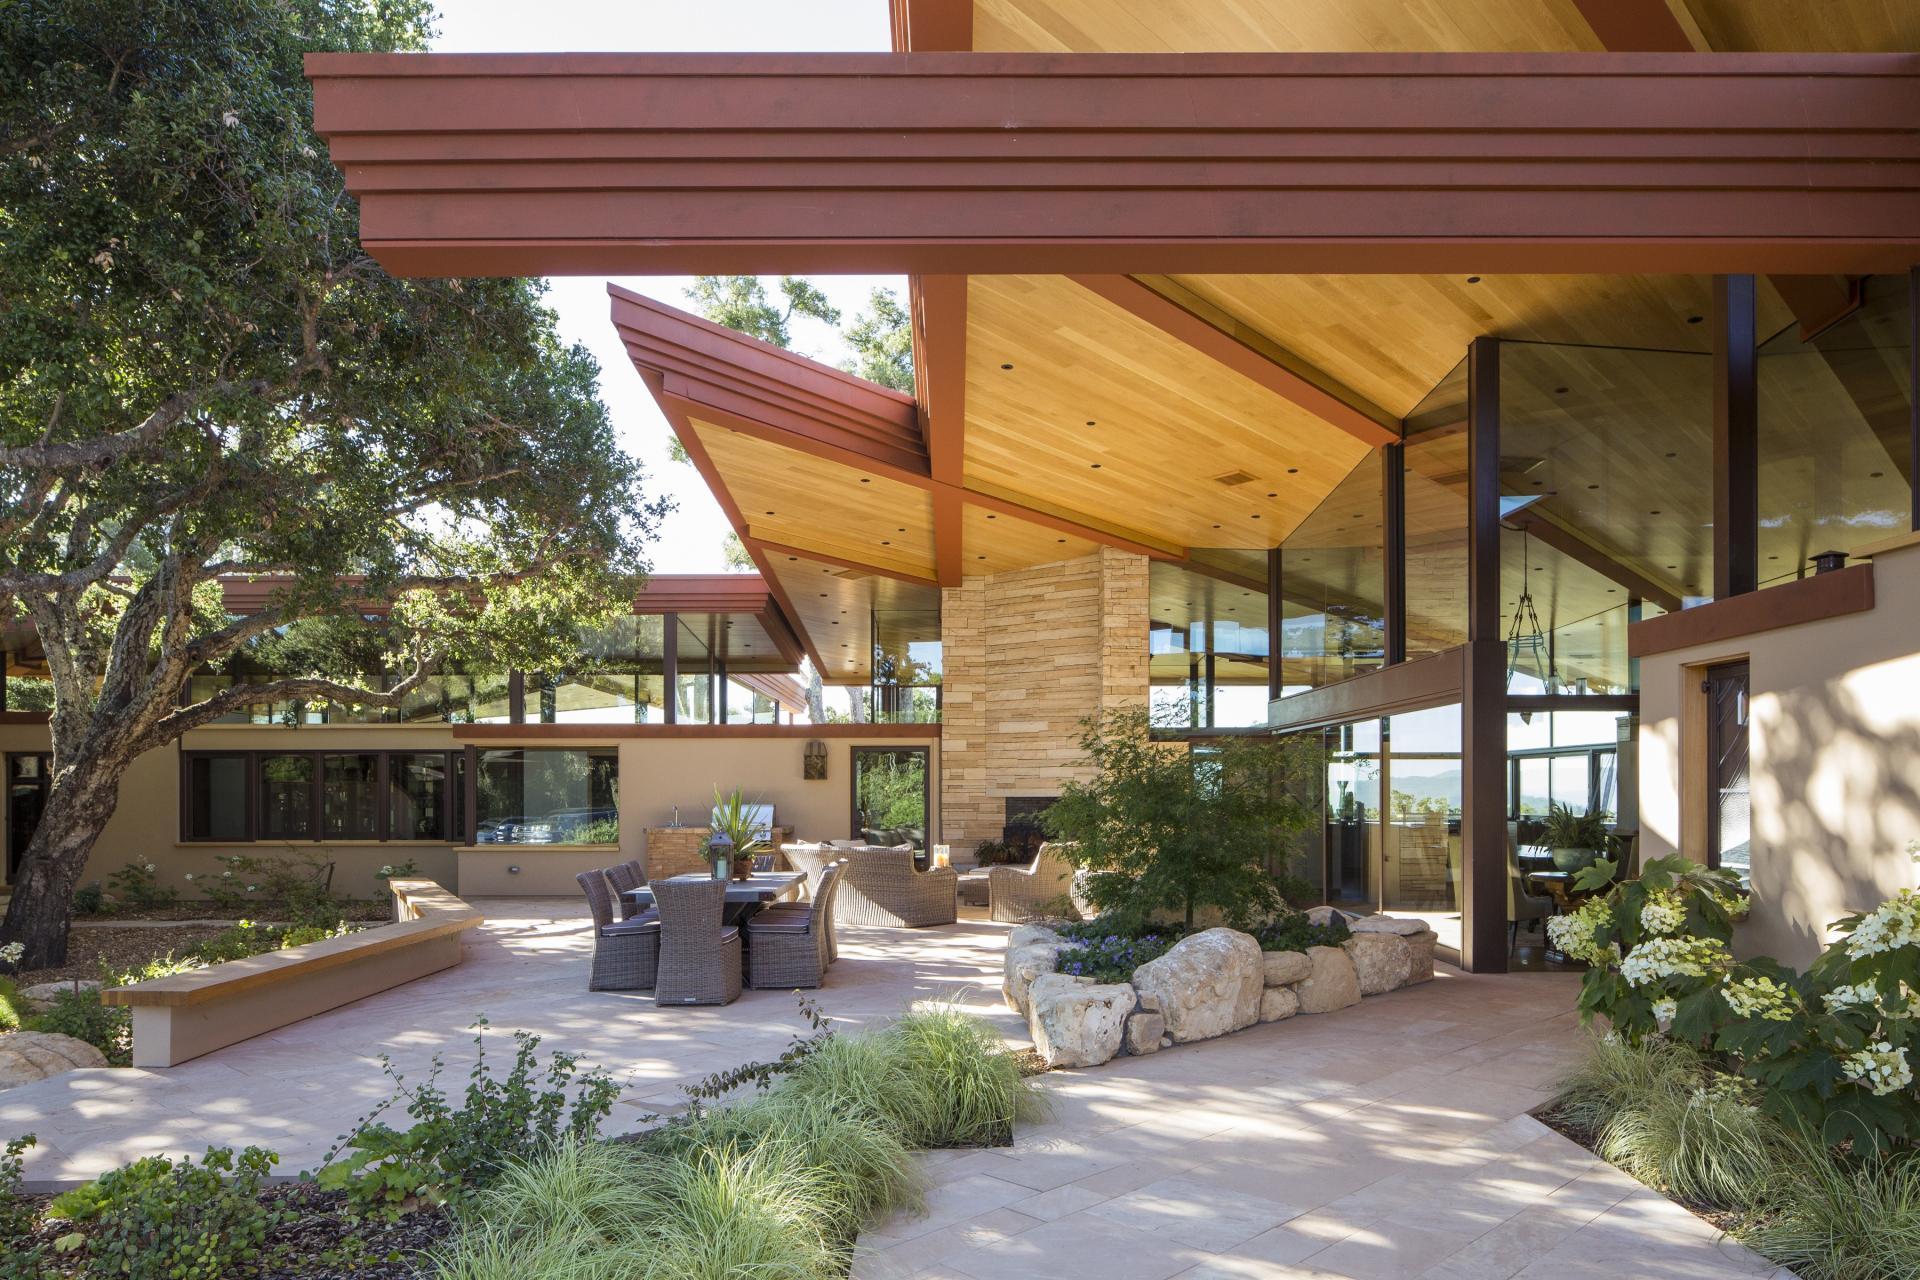 Fox Hollow's house patio